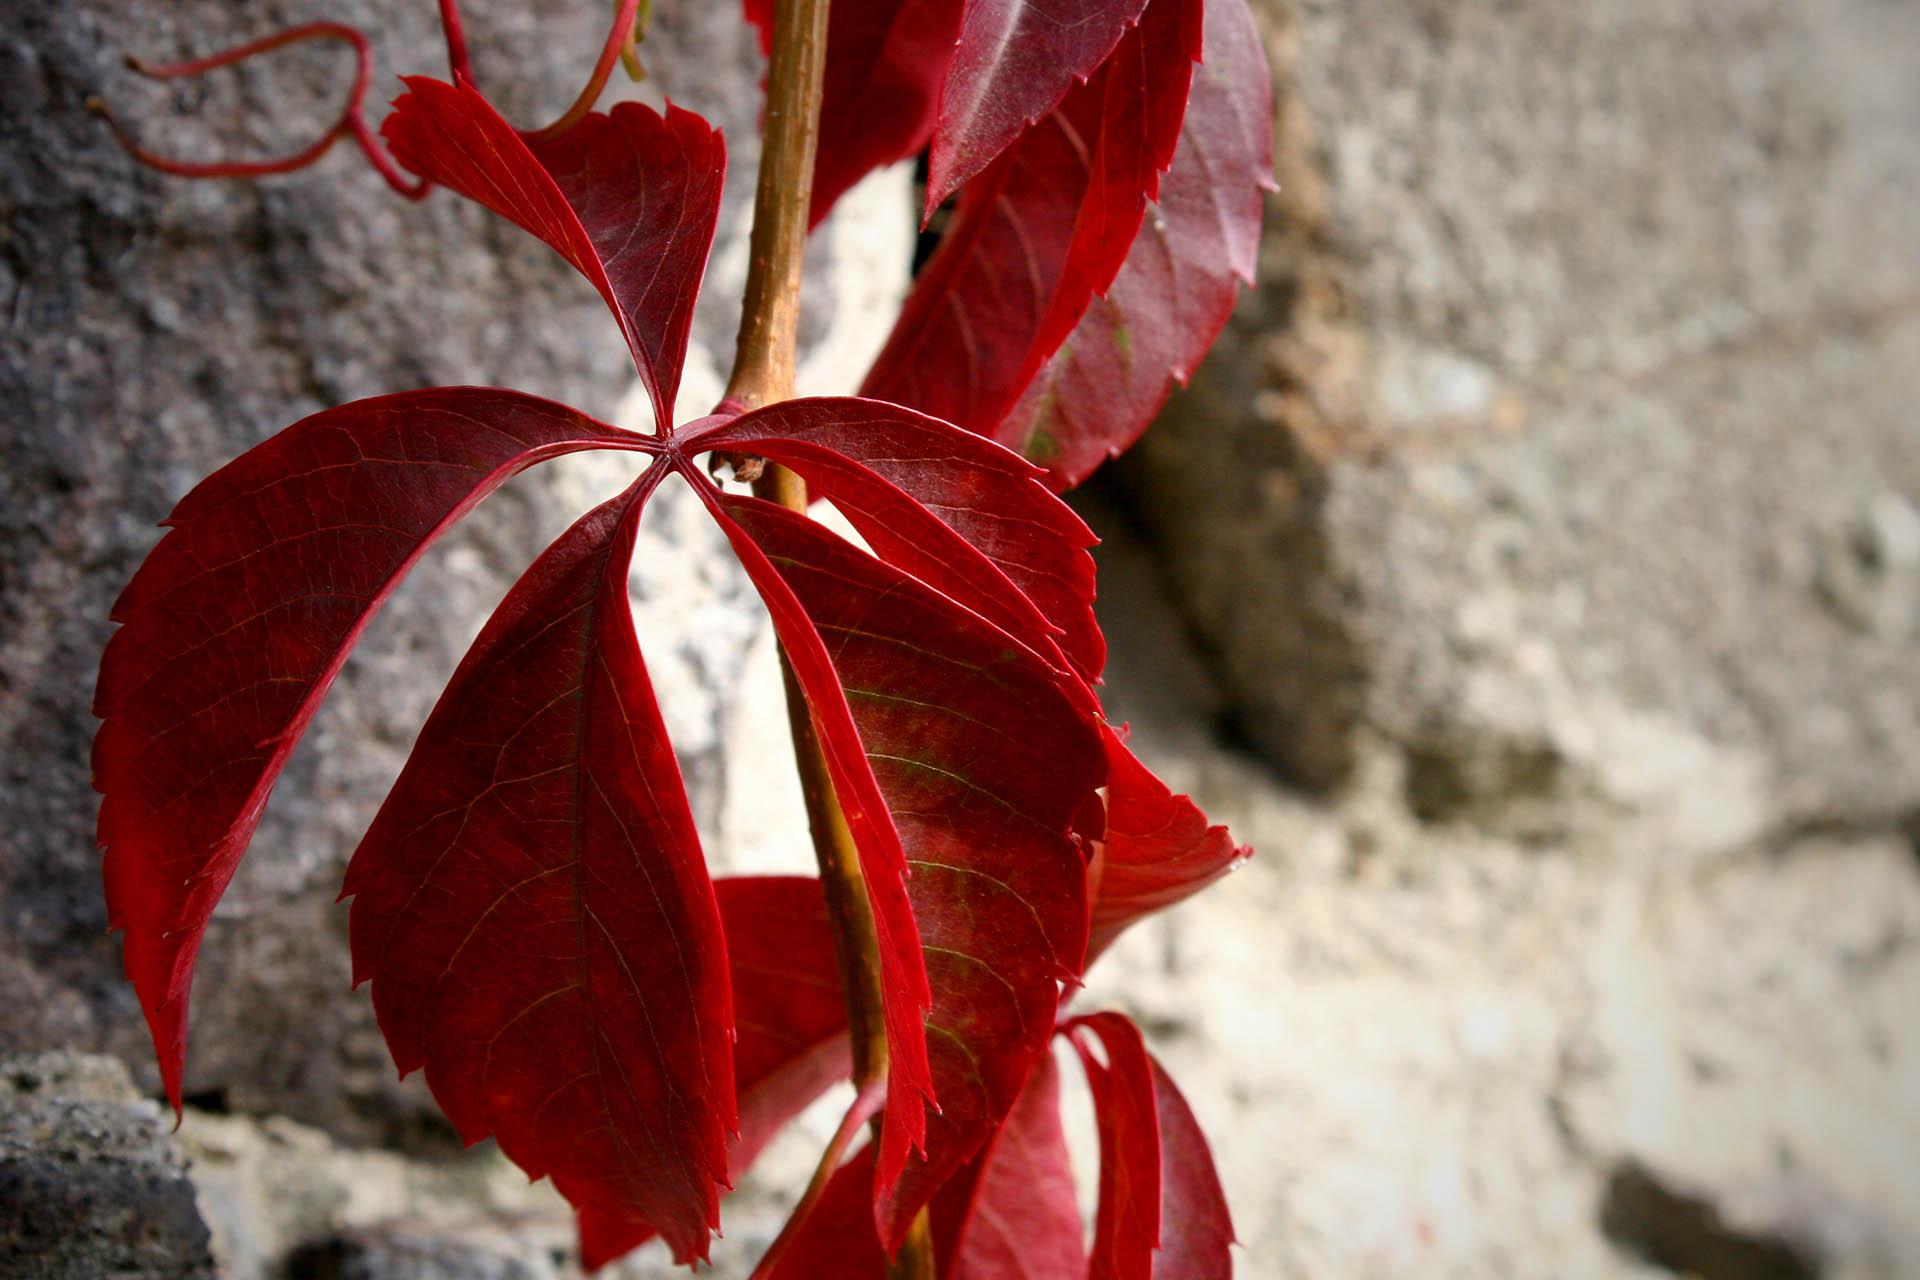 Rotes Weinlaub (Vitis Vinifera)